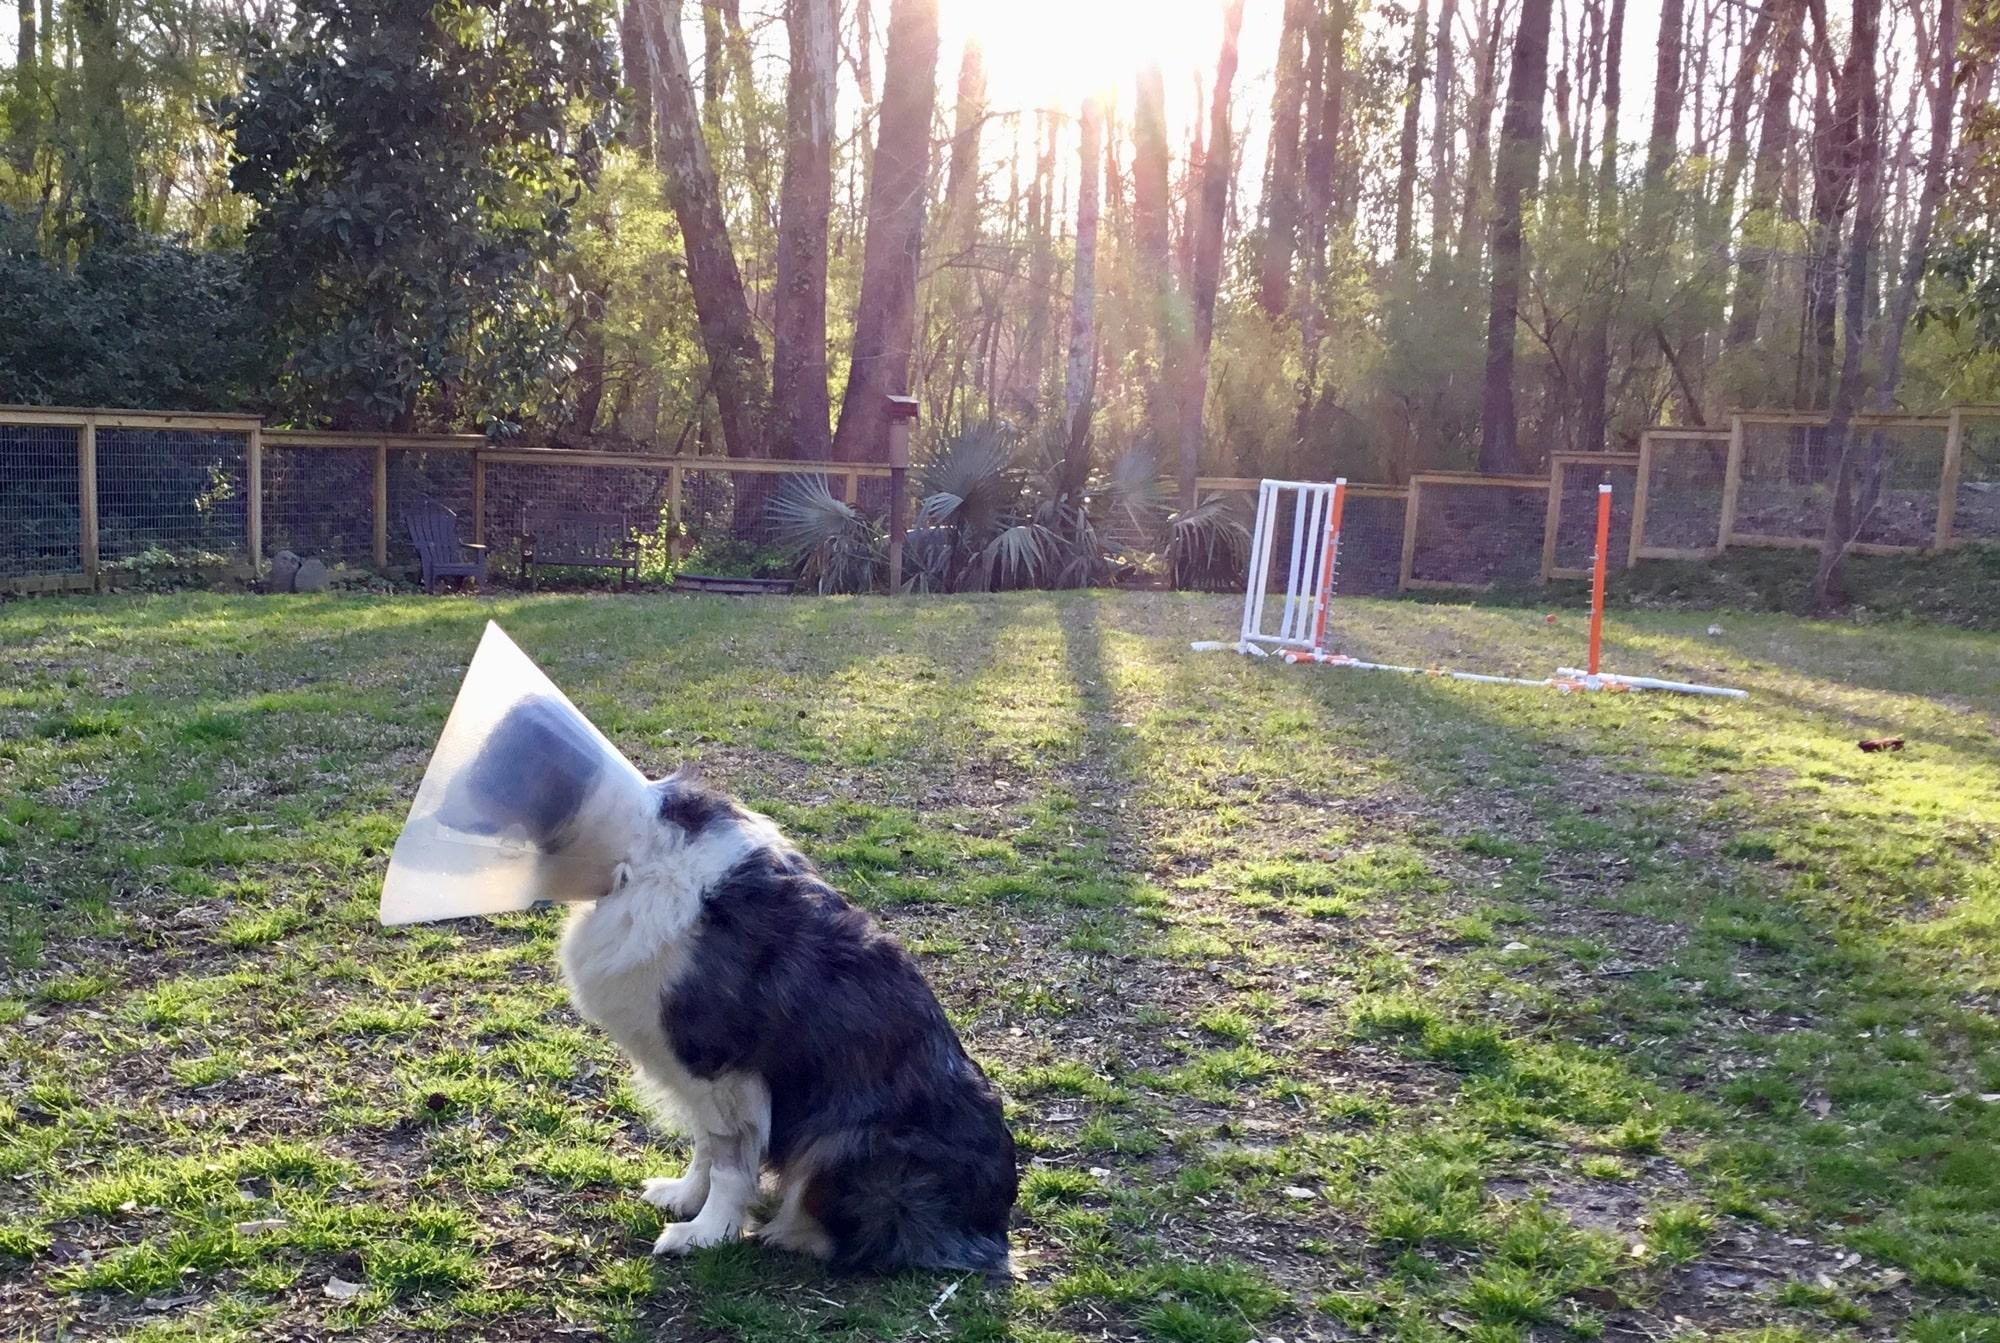 Samba with the cone